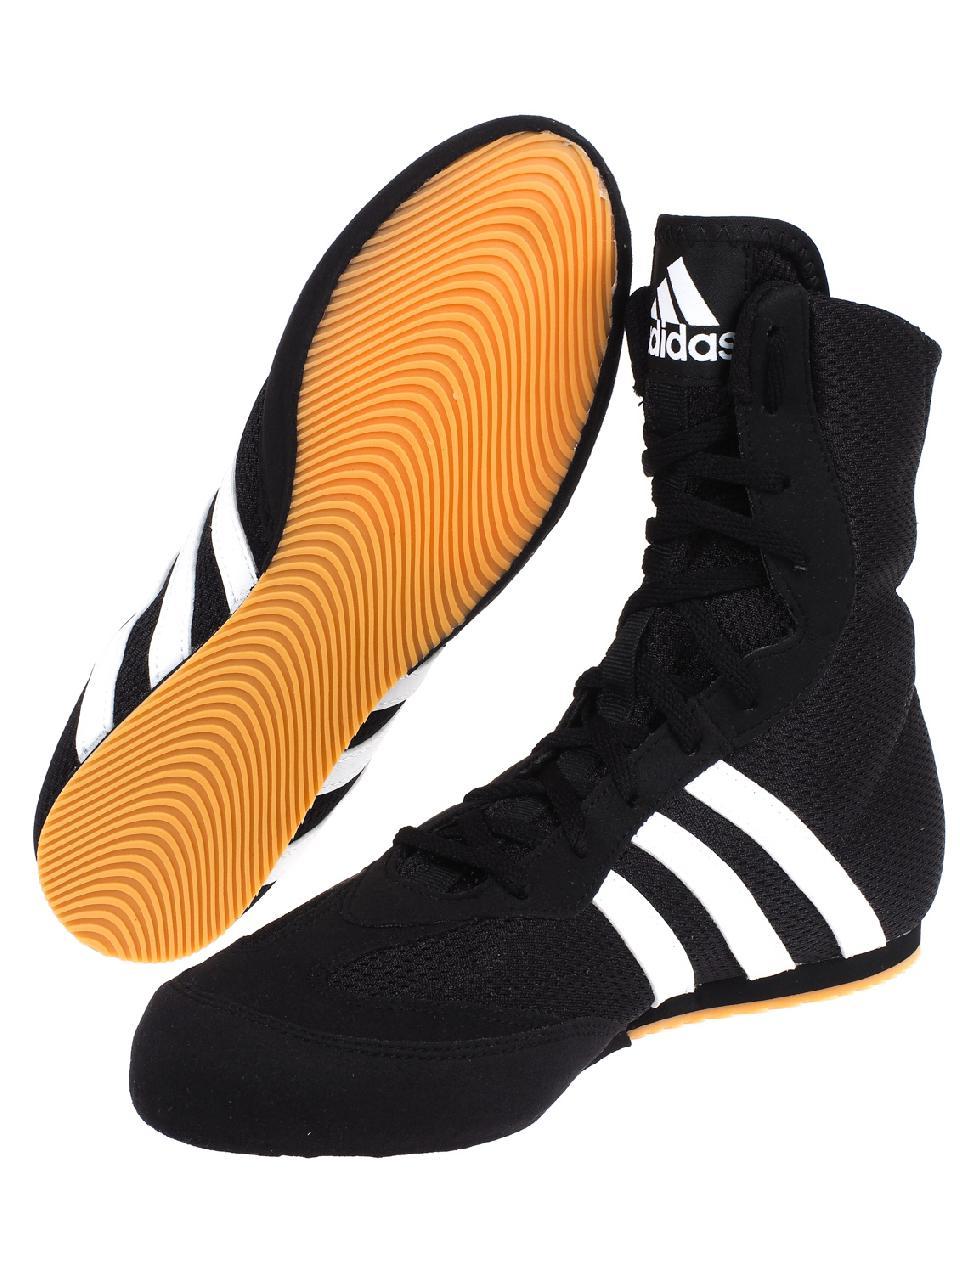 Détails sur Chaussures boxe Doubled adidas Chaussures boxe anglaise Noir 22975 Neuf